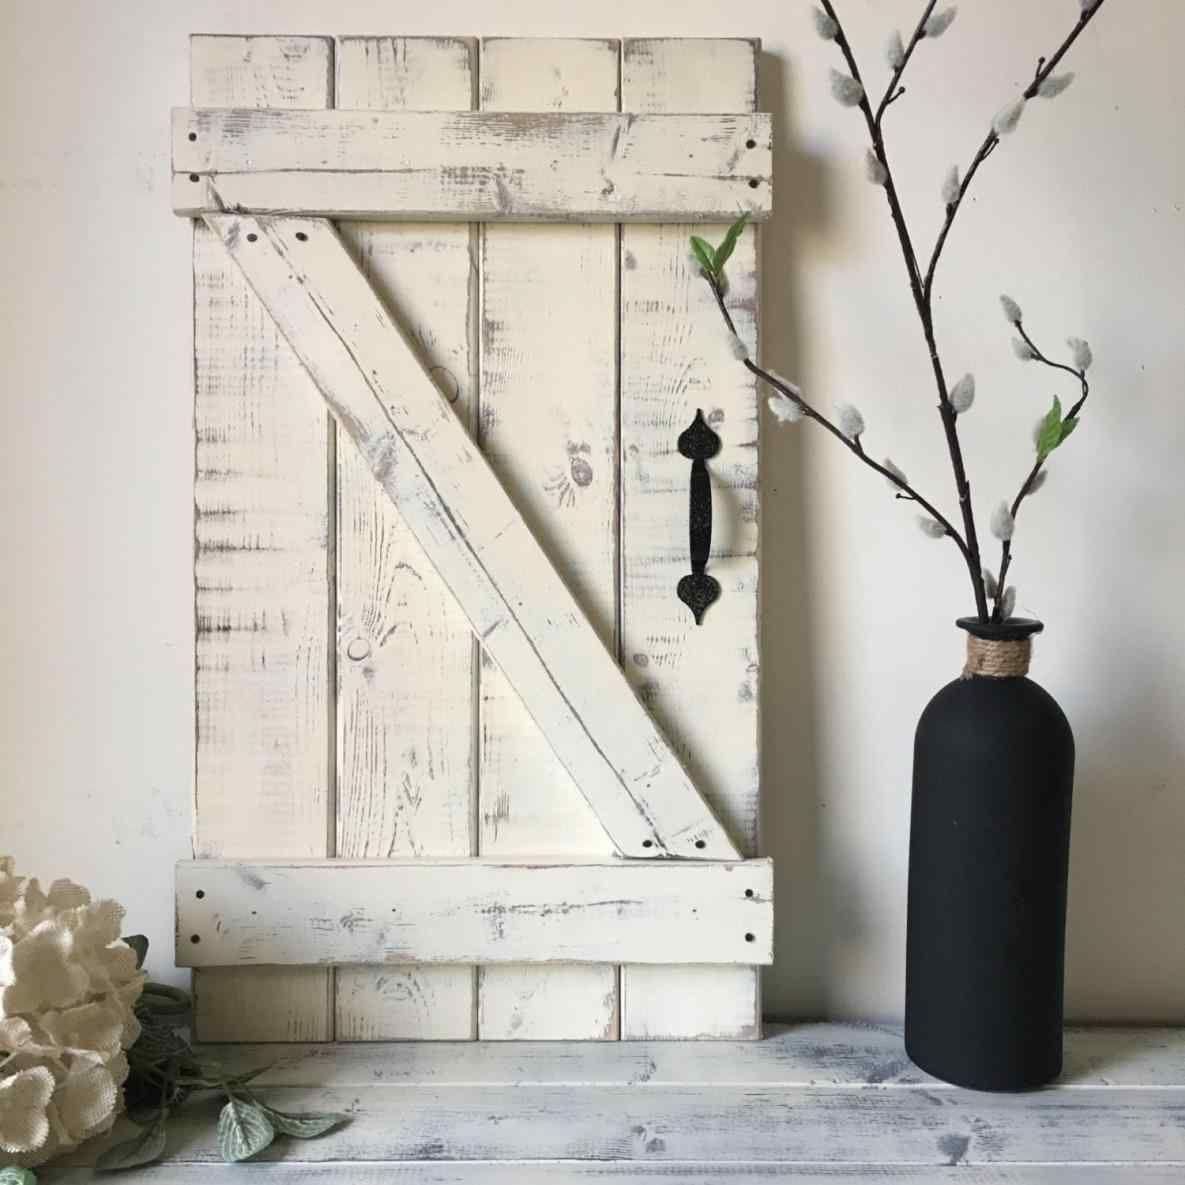 Top 14 Unique Sliding Barn Door Wall Decor Ideas For Inspiration Barn Door Shutters Barn Door Decor Wood Doors Interior